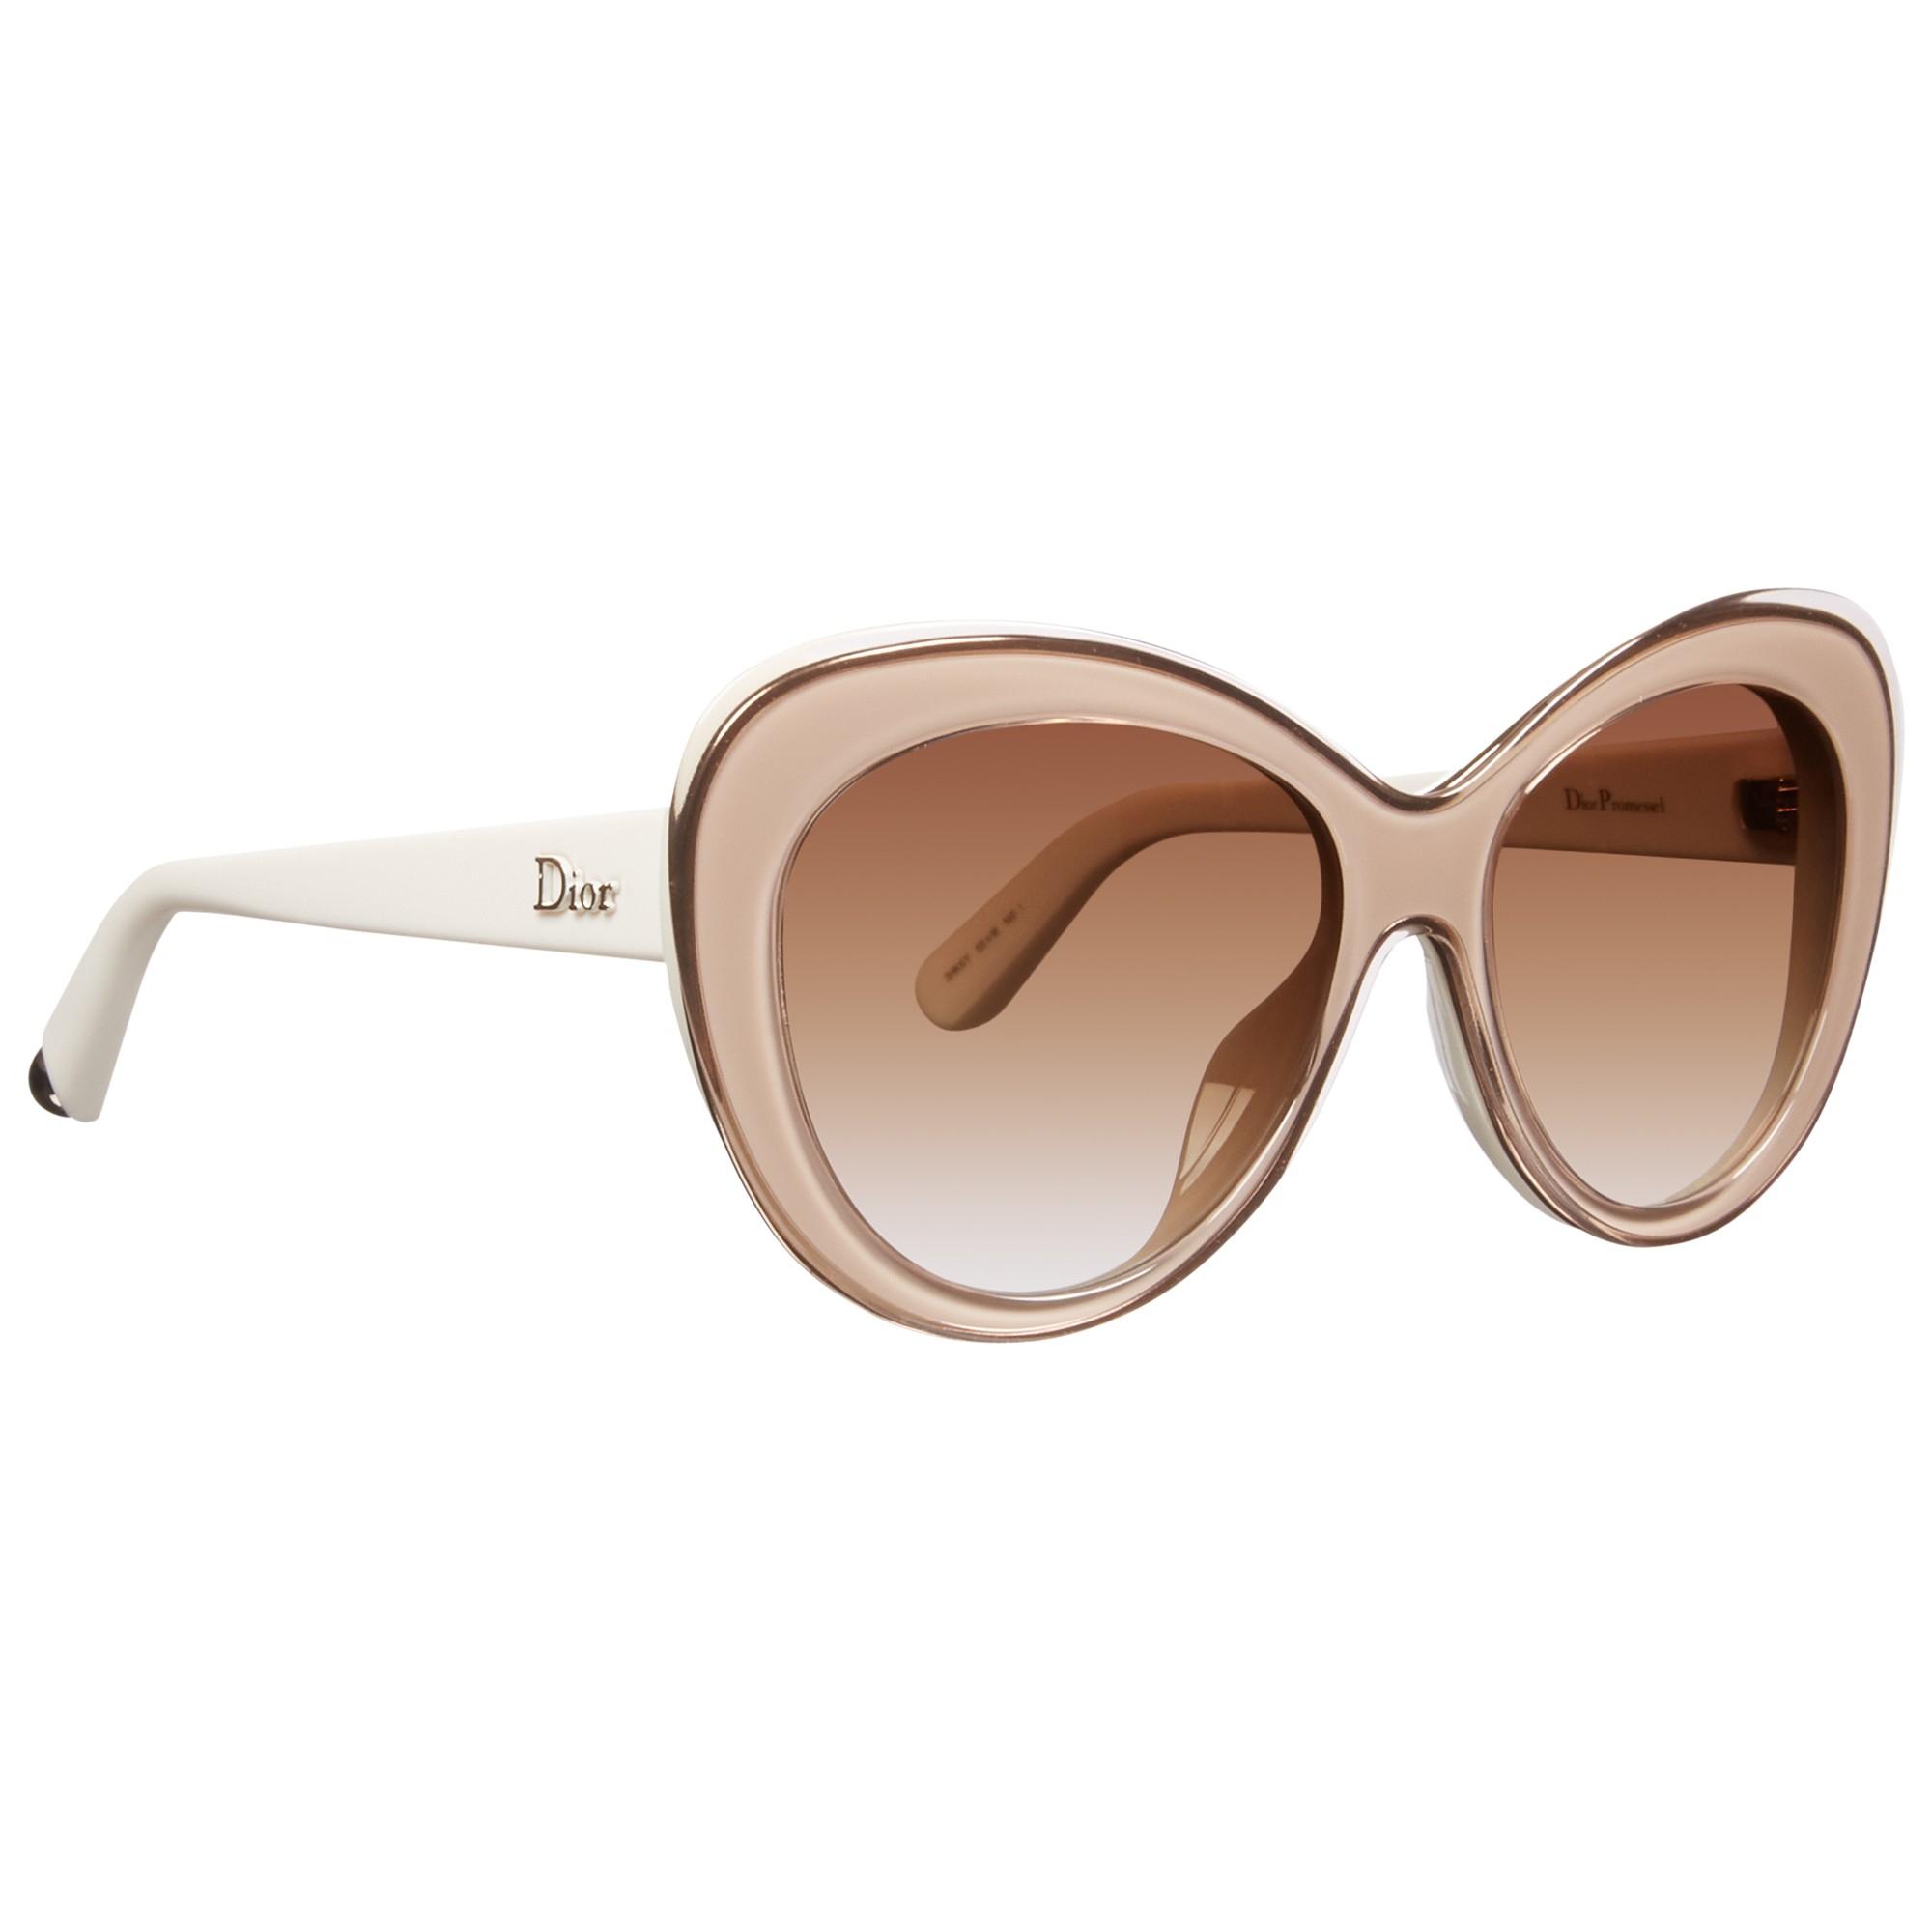 Dior Glasses Frame 2014 : Dior Diorpromesse1 3hk6y Cats Eye Acetate Frame ...